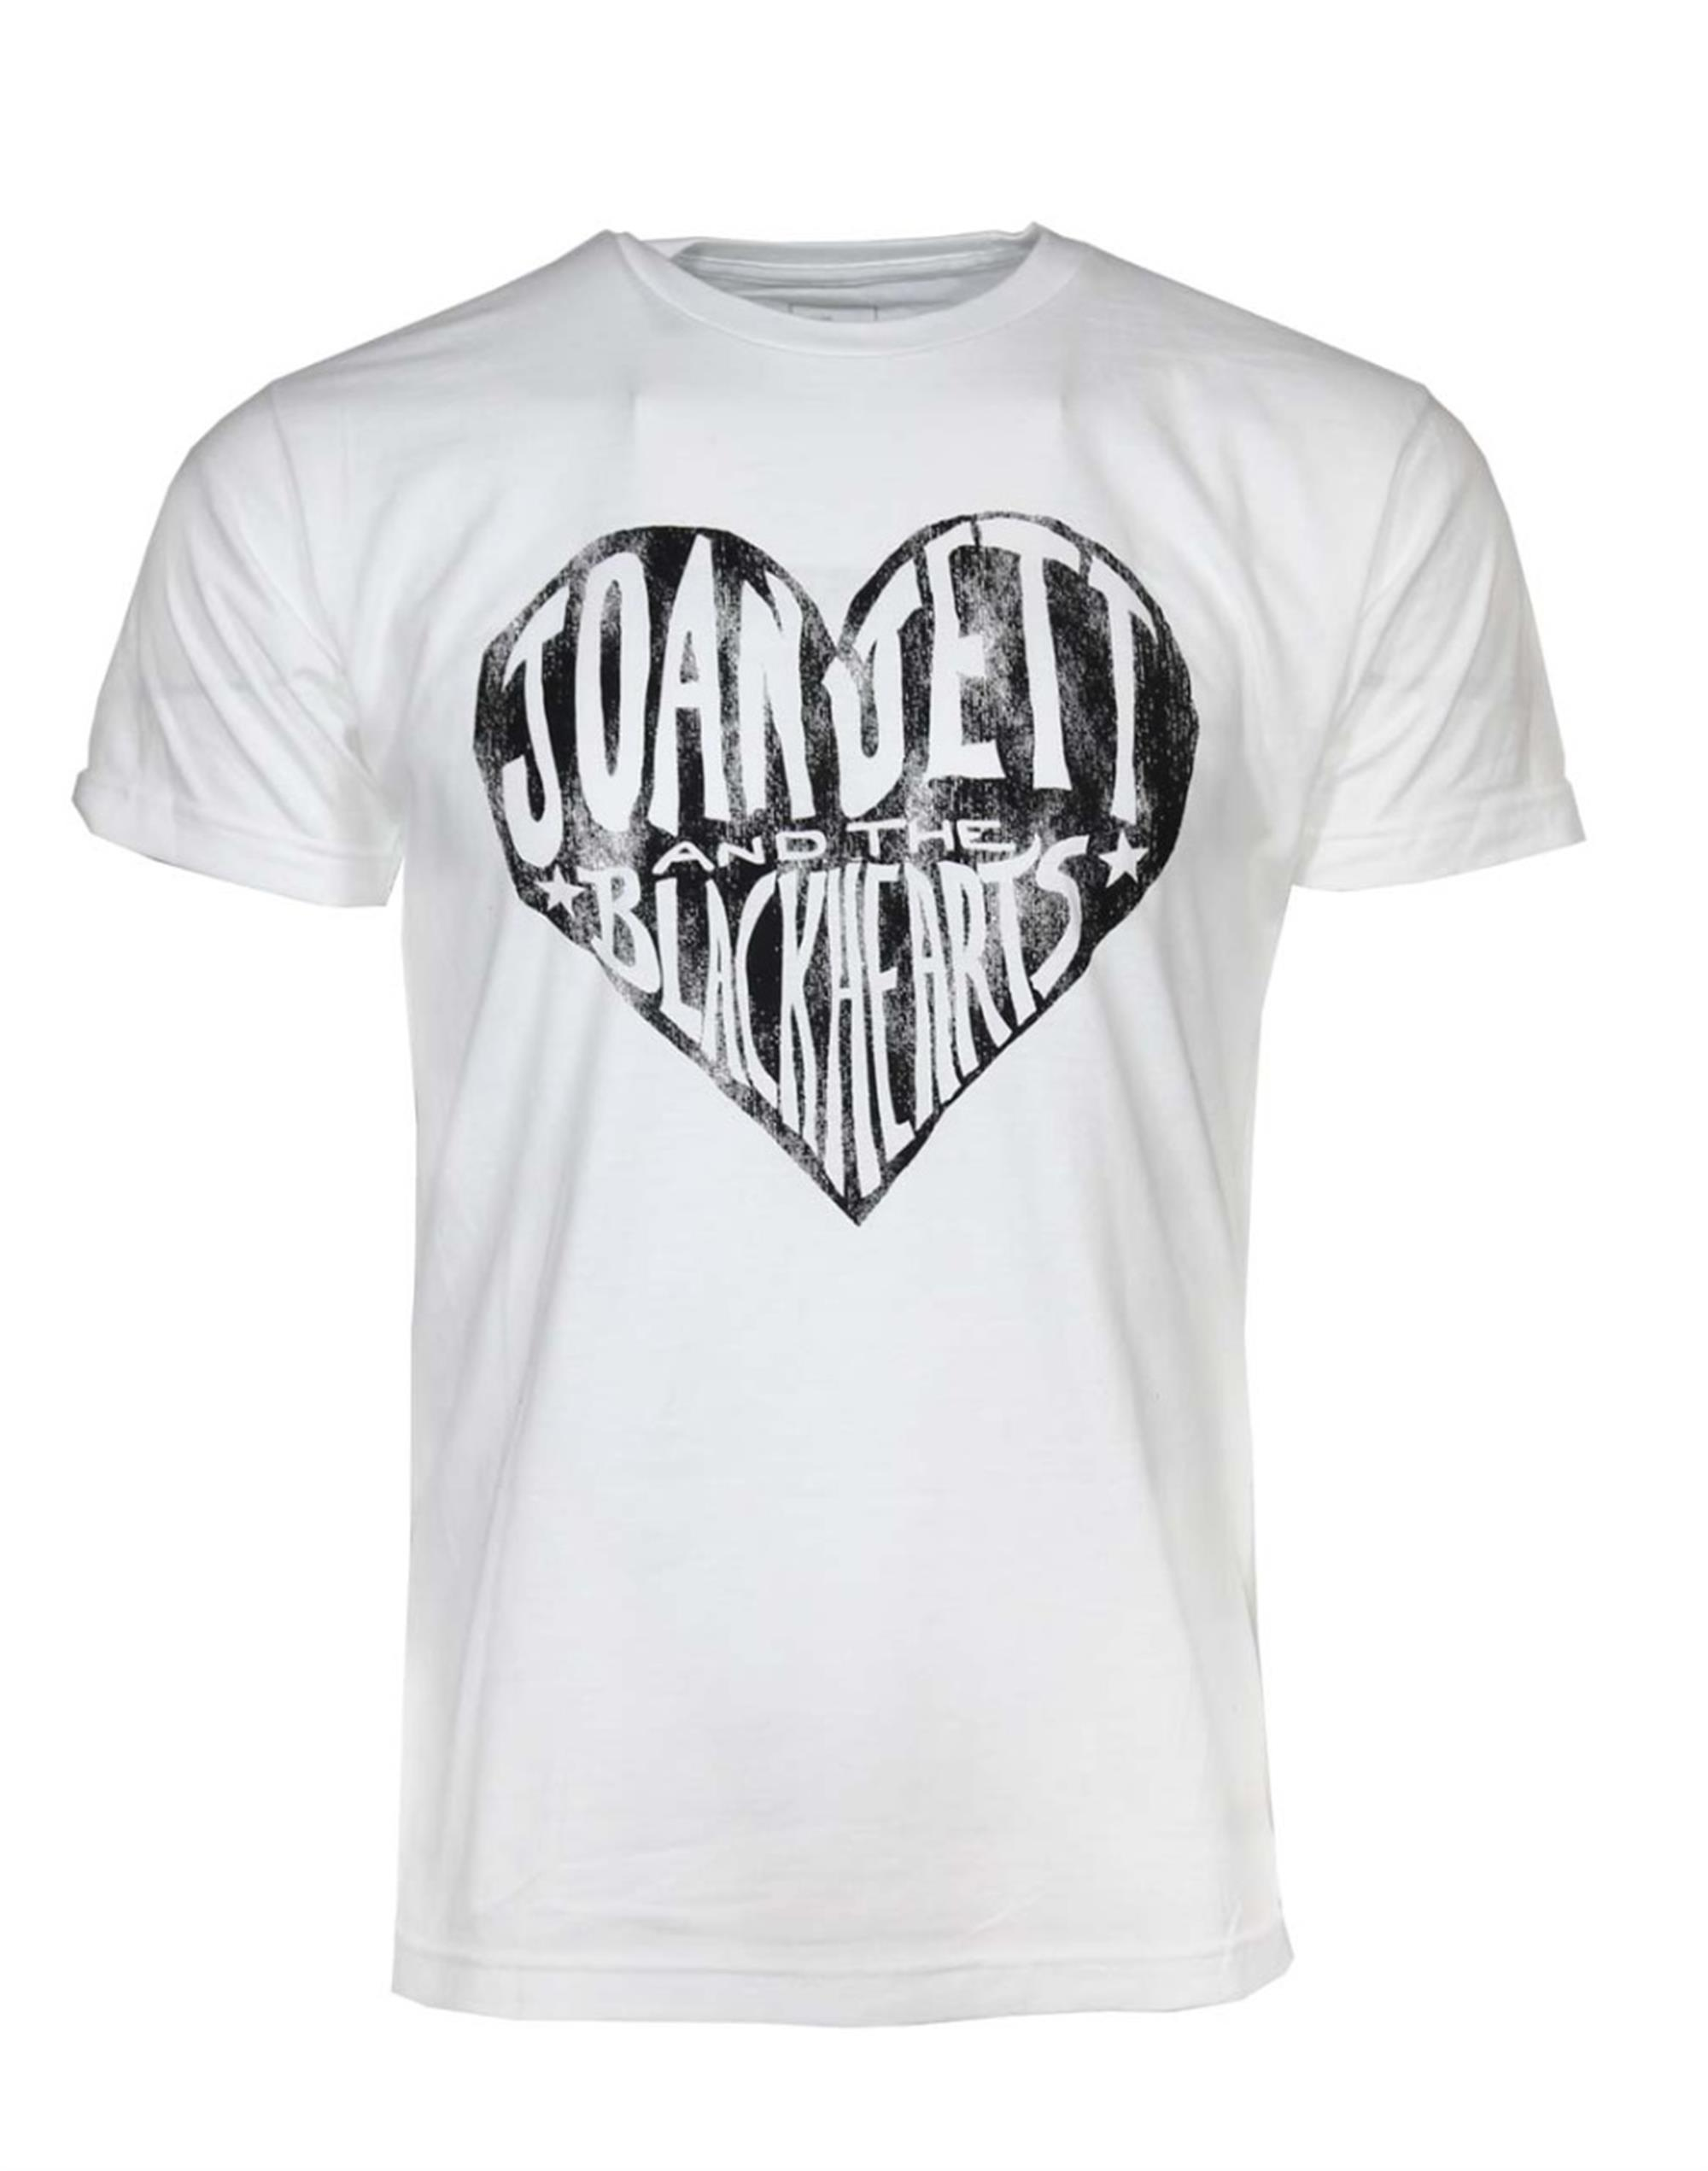 JoanJettBlackhearts White T-Shirt